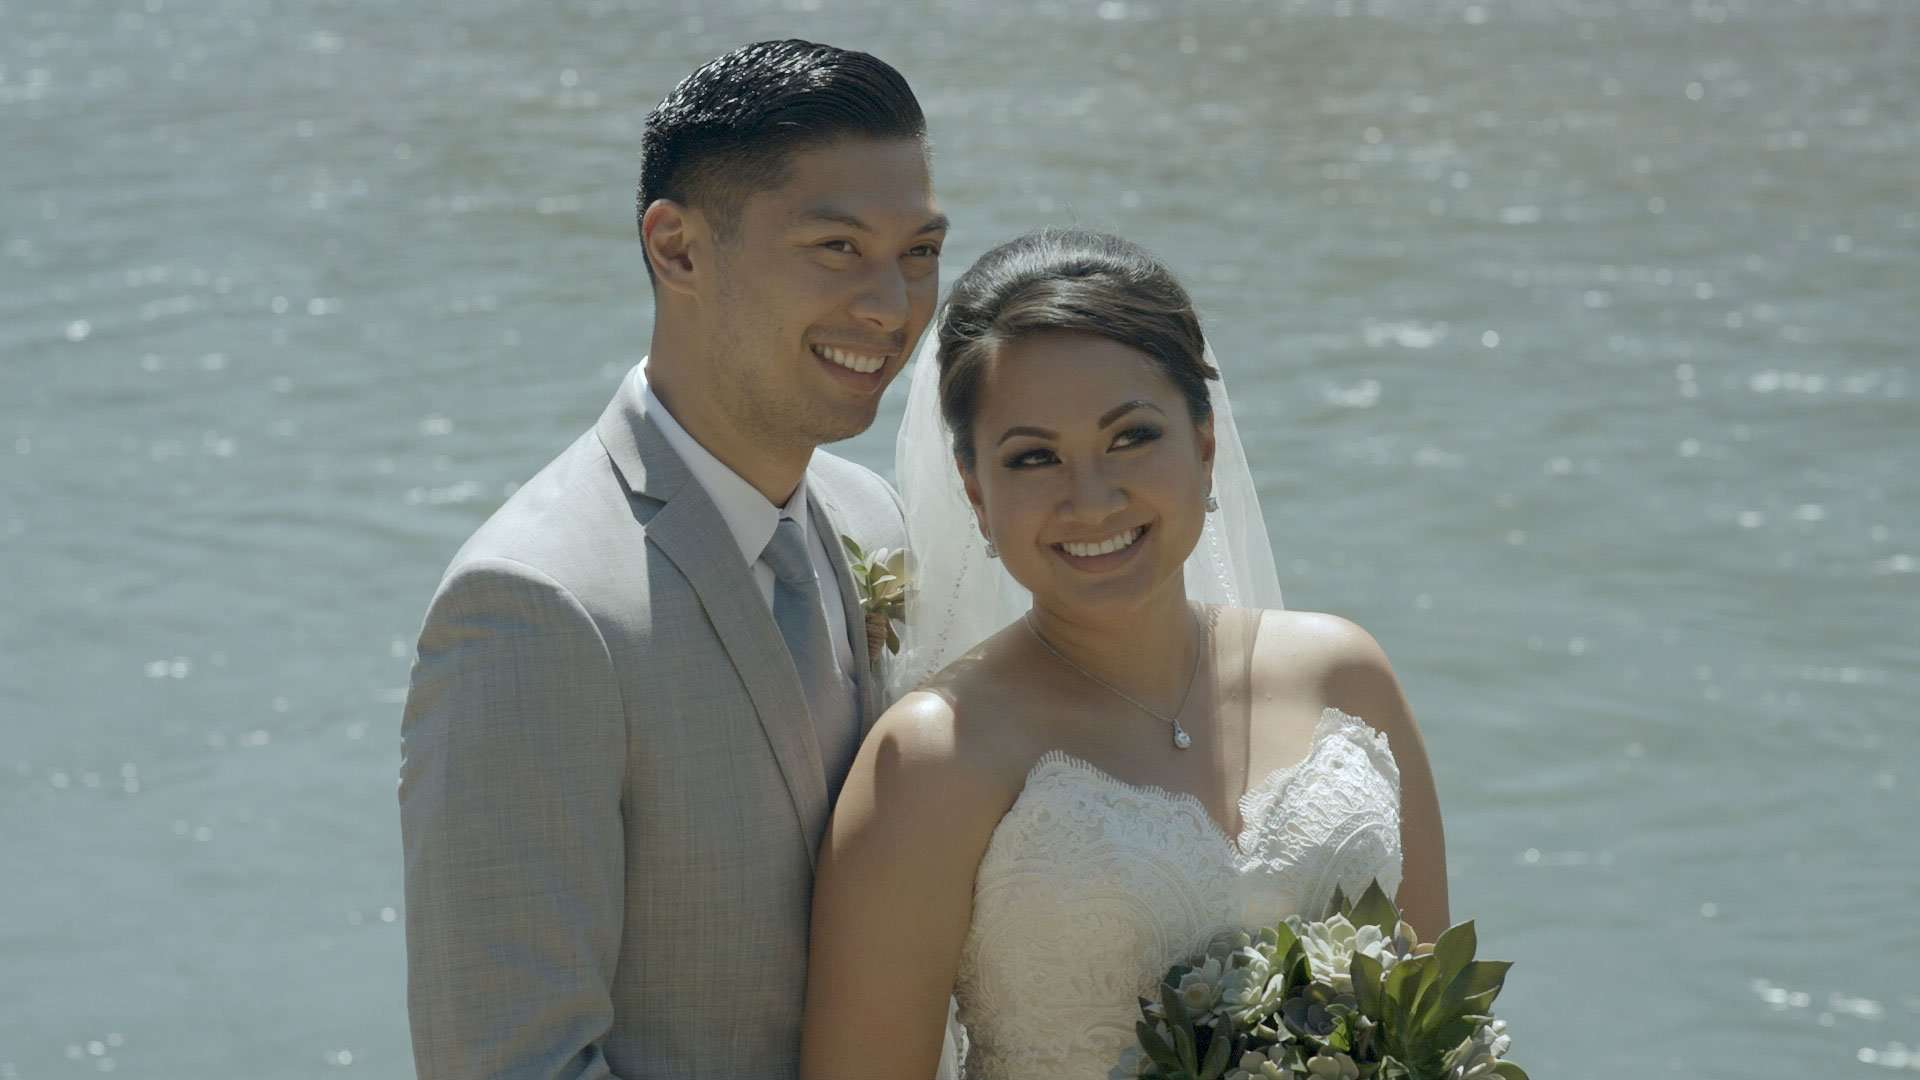 Banff wedding videographer